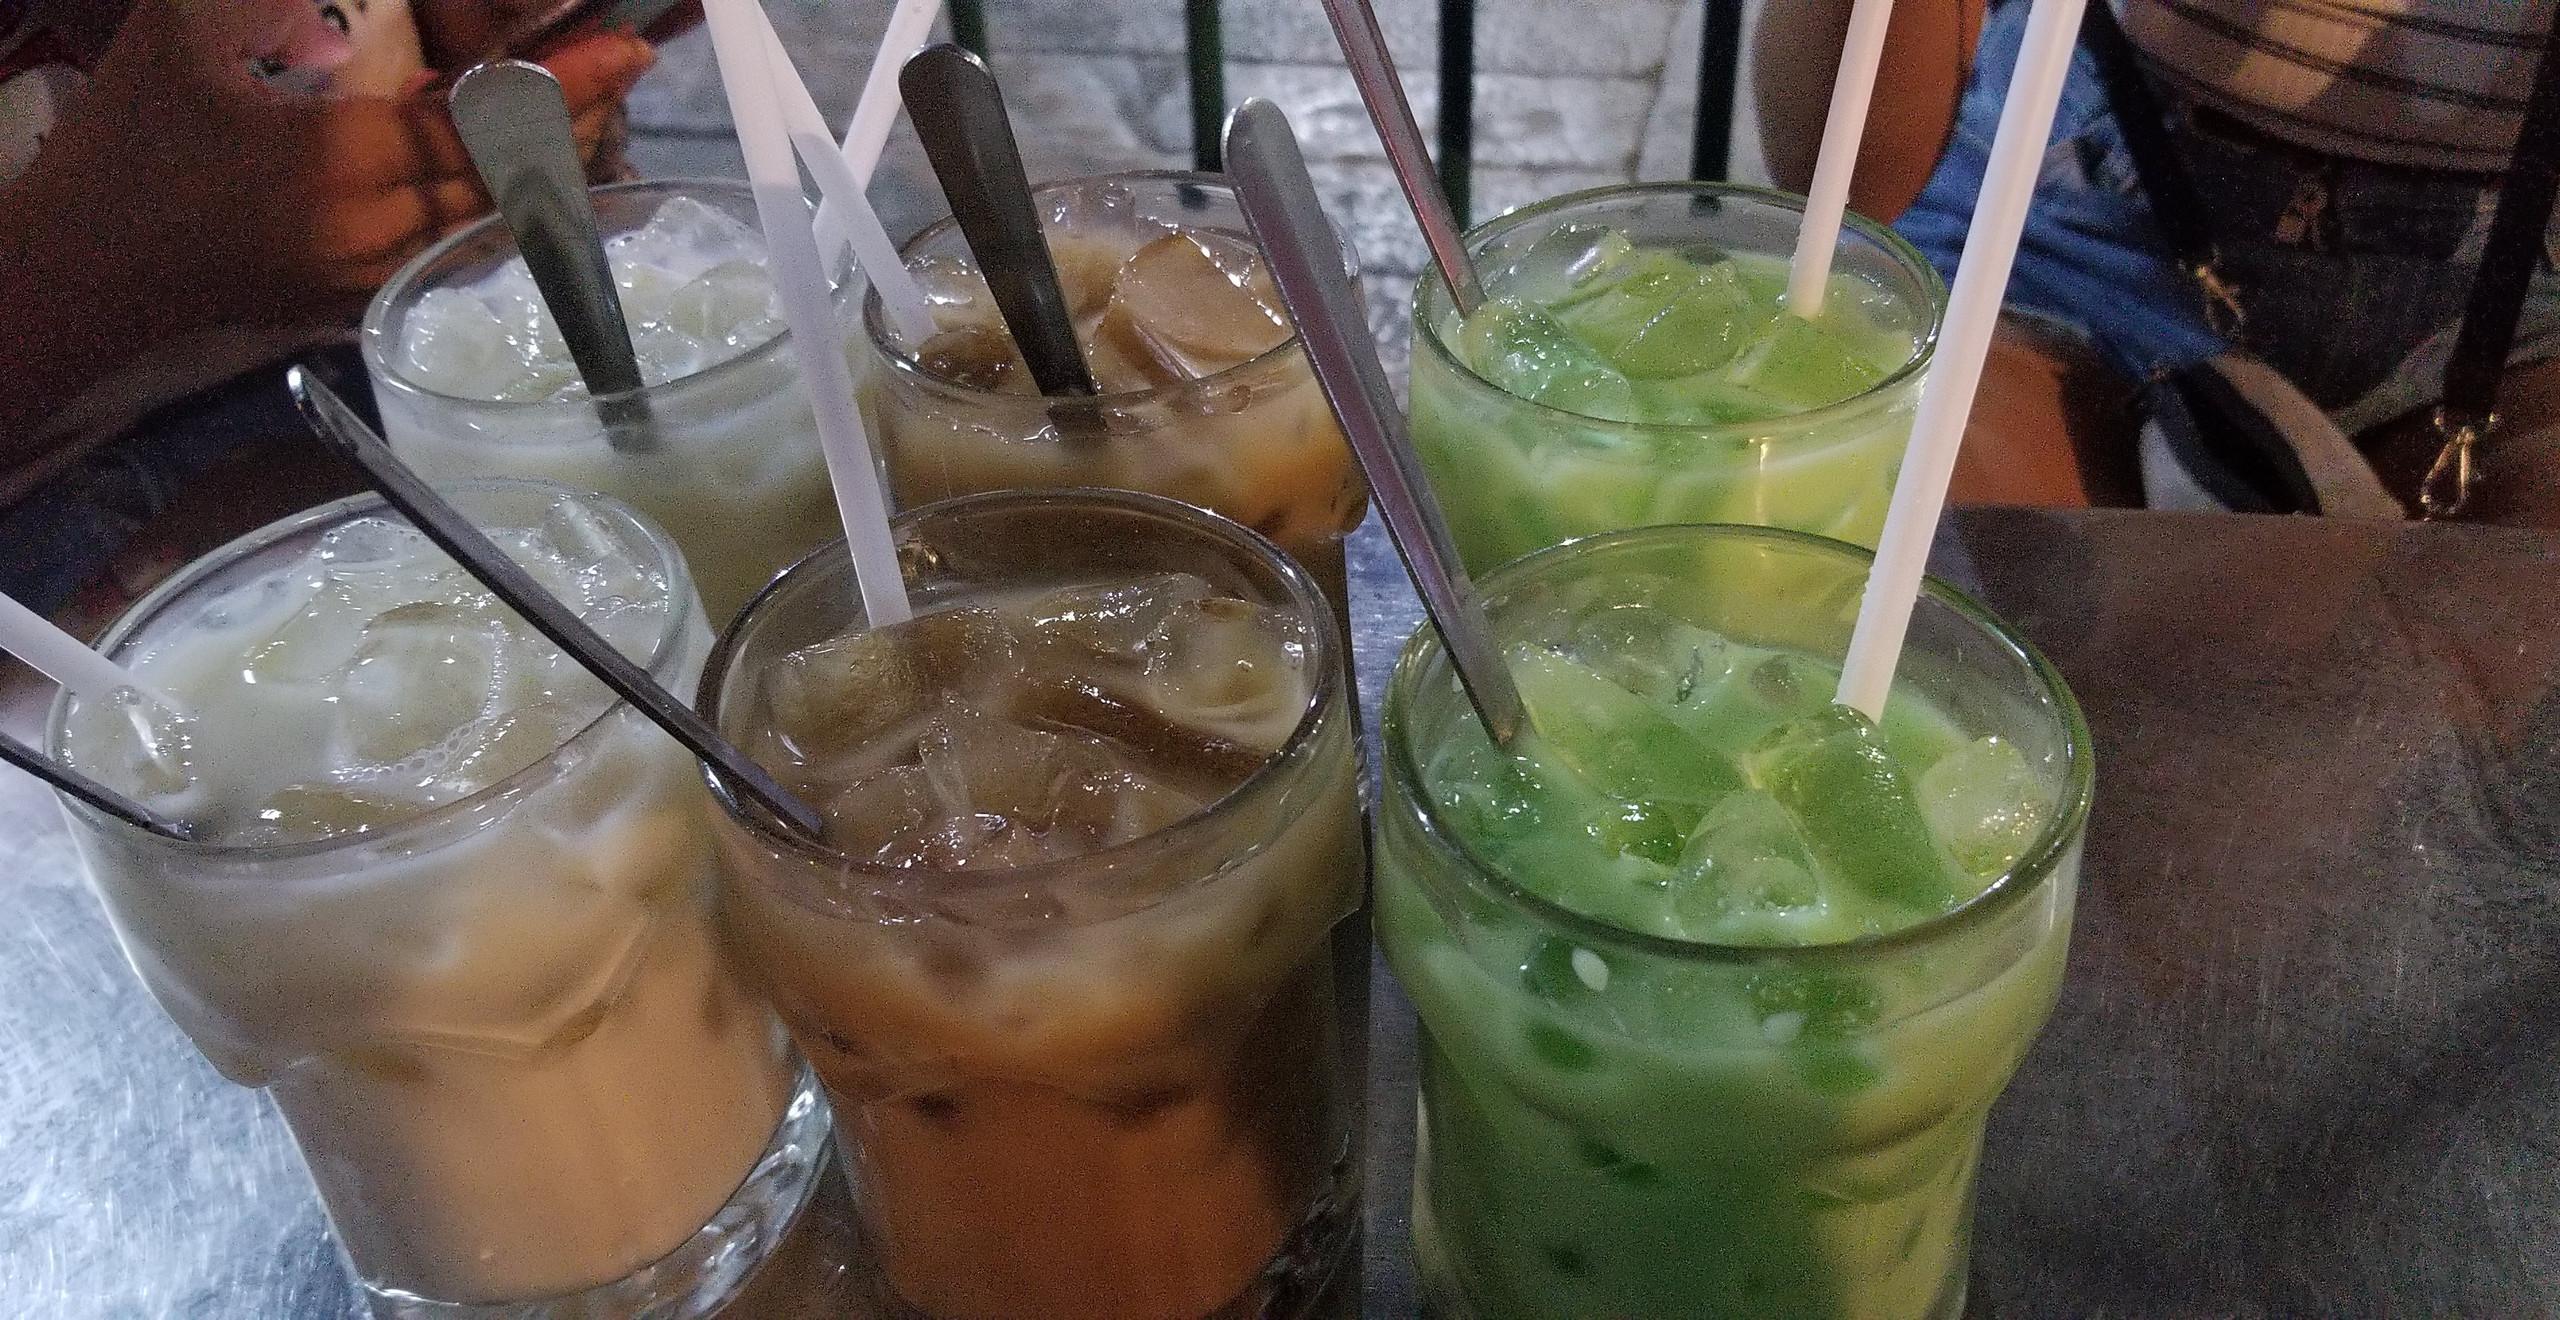 Left to right: Soy/Rice milk, Peanut/Rice milk, Mint/Rice milk